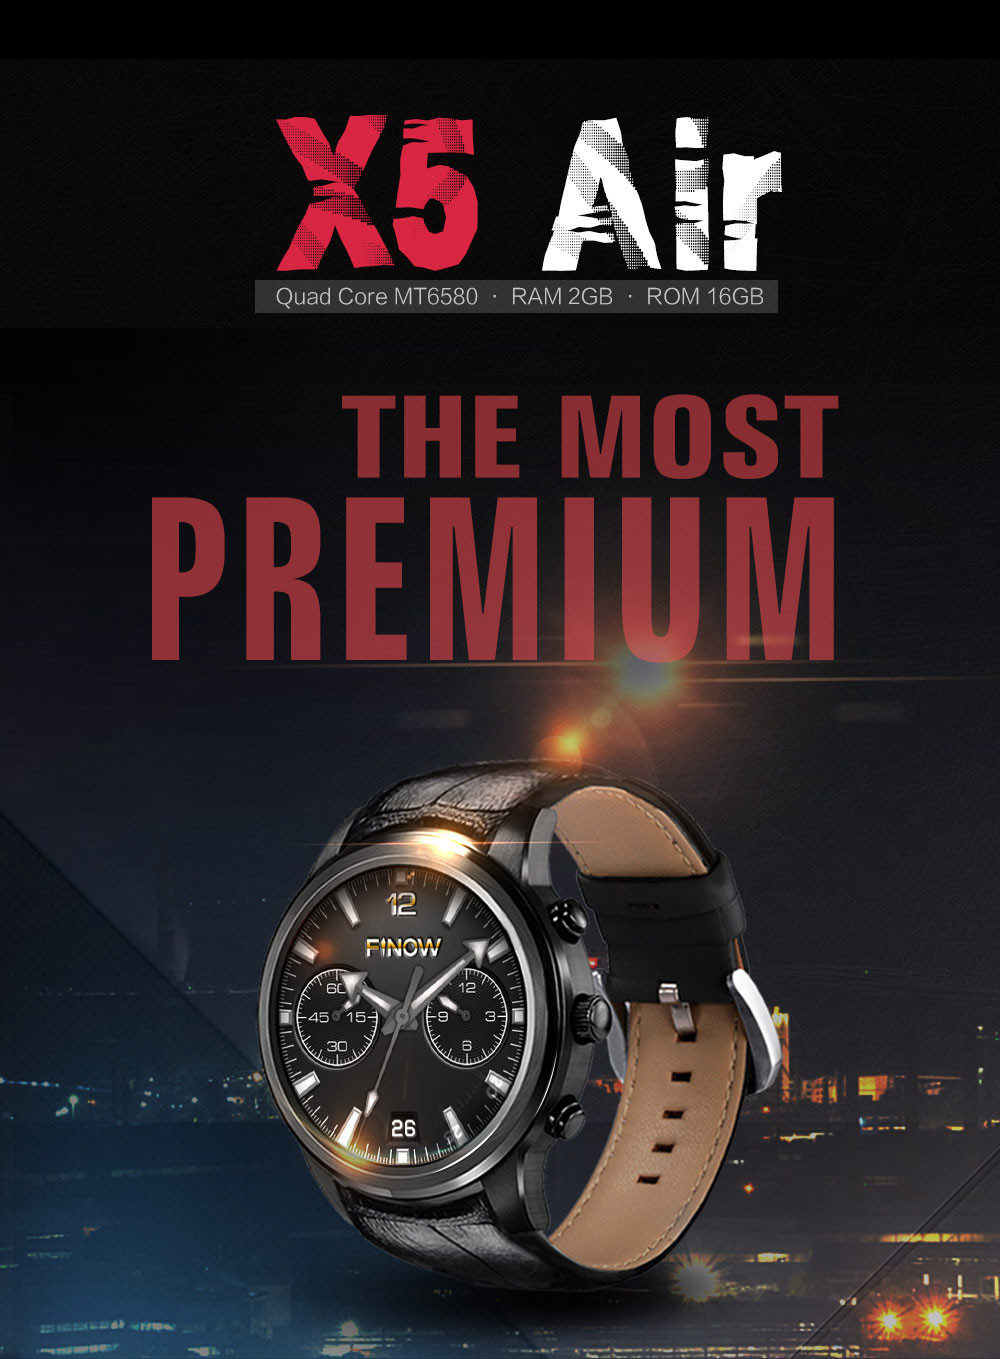 finow x5 air smart watch02